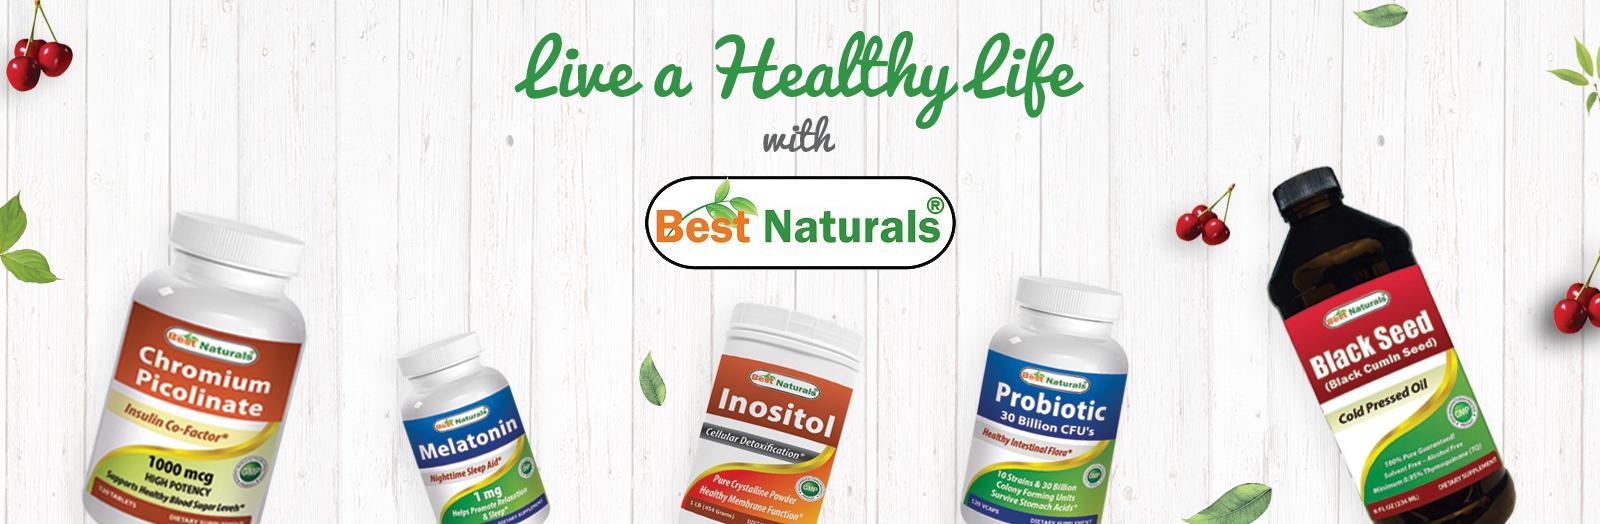 Best Naturals Peppermint Oil Capsules